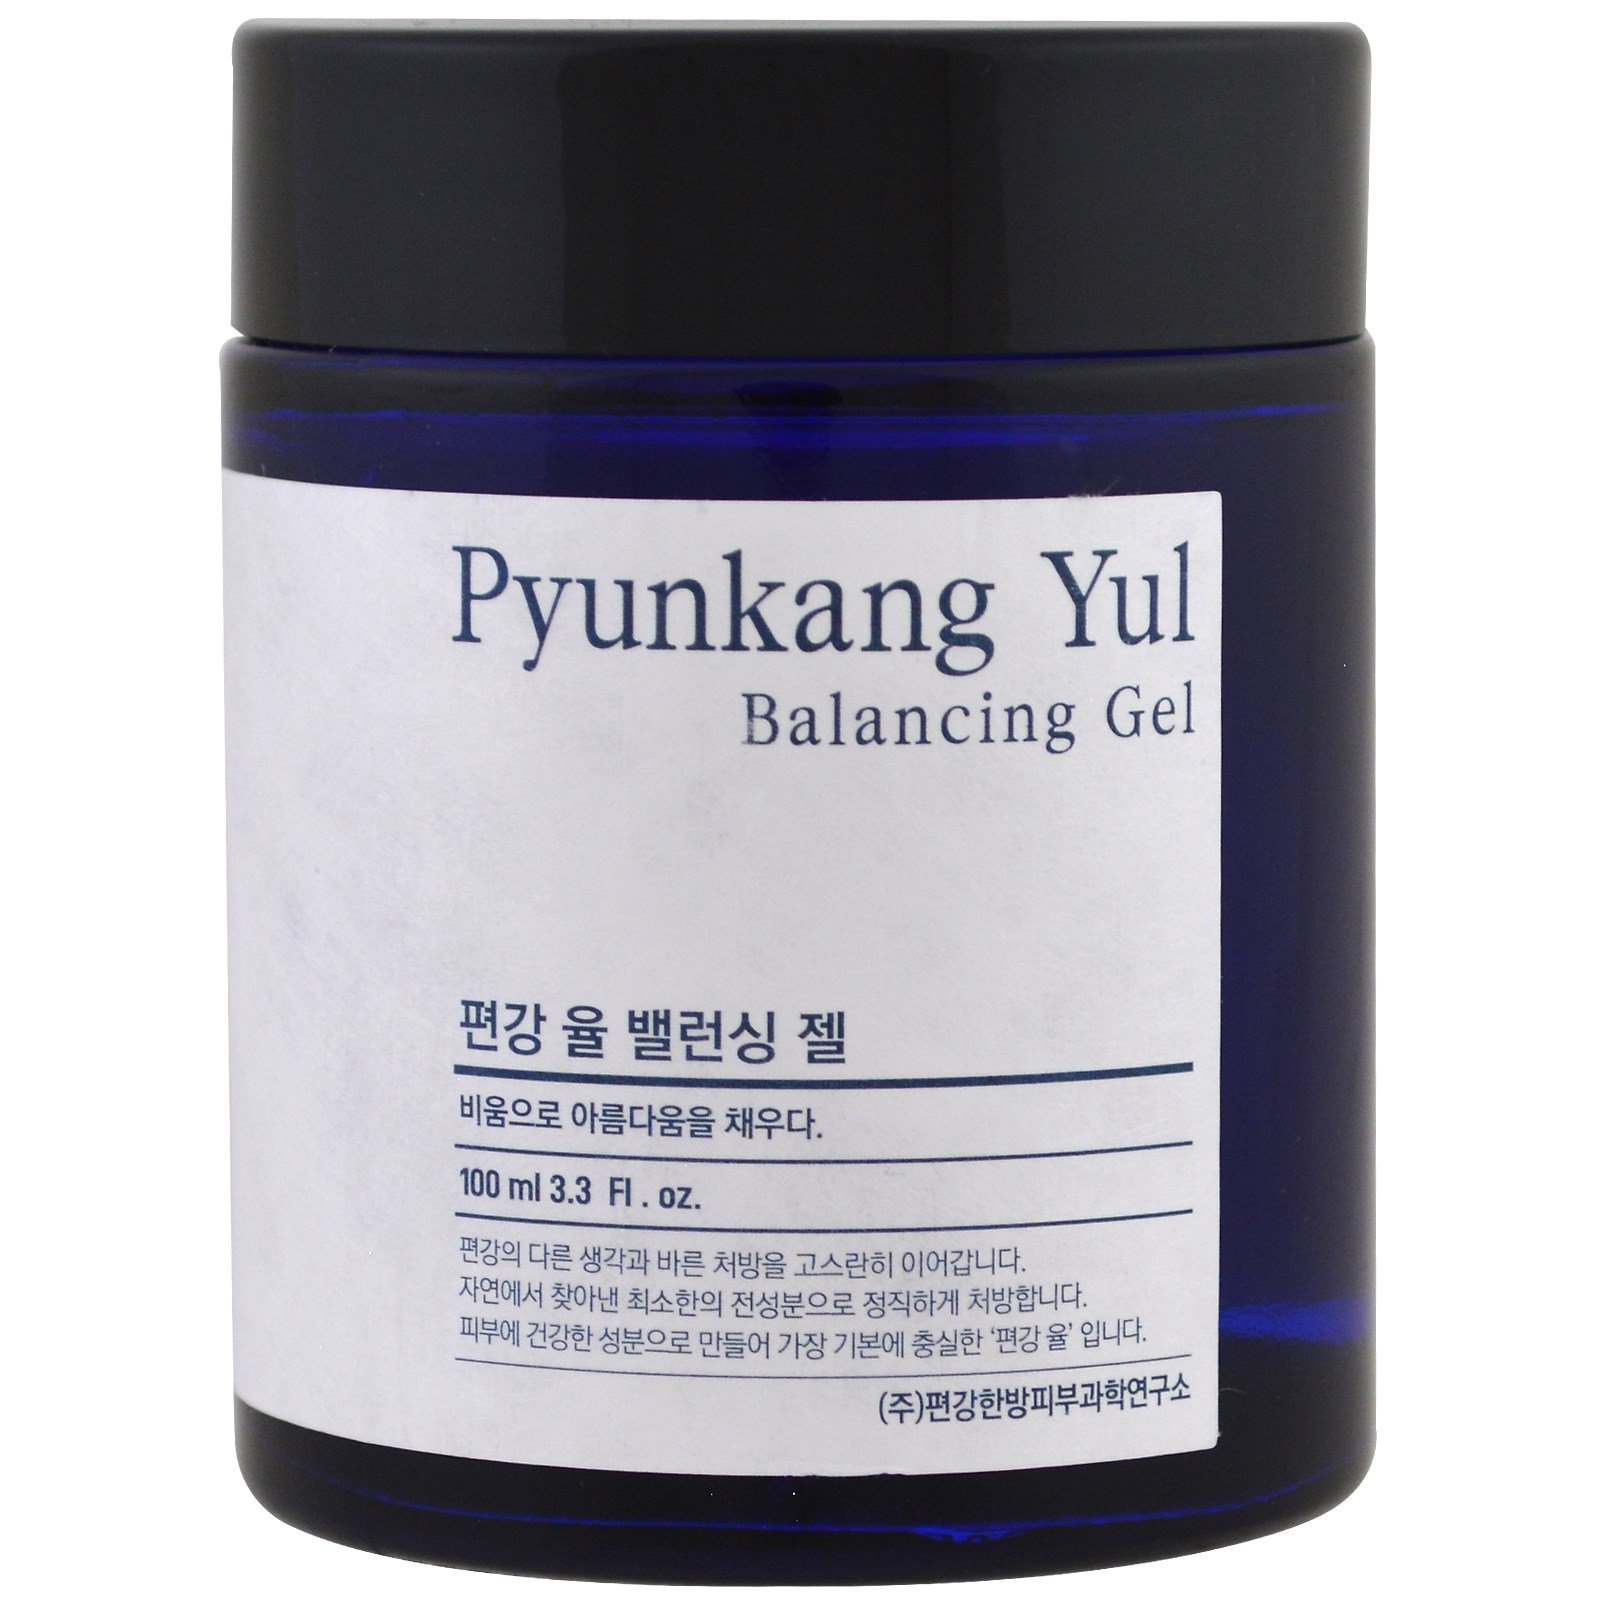 Pyunkang Yul, Гель, улучшающий биологический баланс кожи, 3,3 ж. унц. (100 мл)